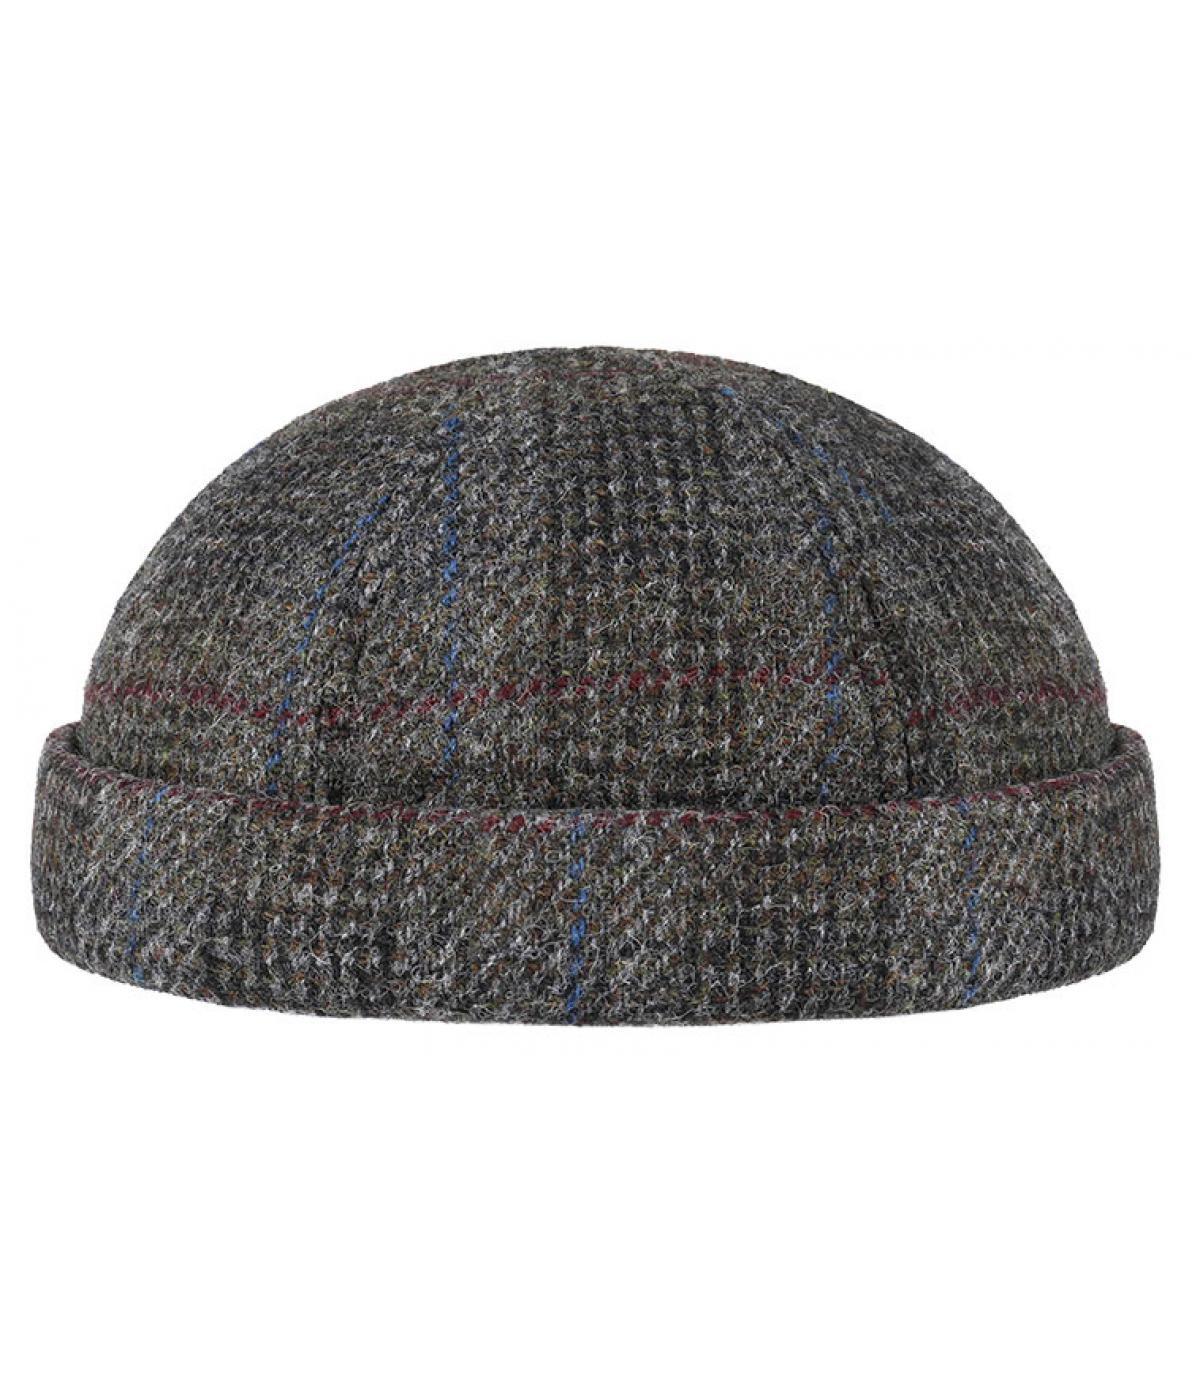 Details Docker Harris Tweed Virgin Wool grey - Abbildung 2